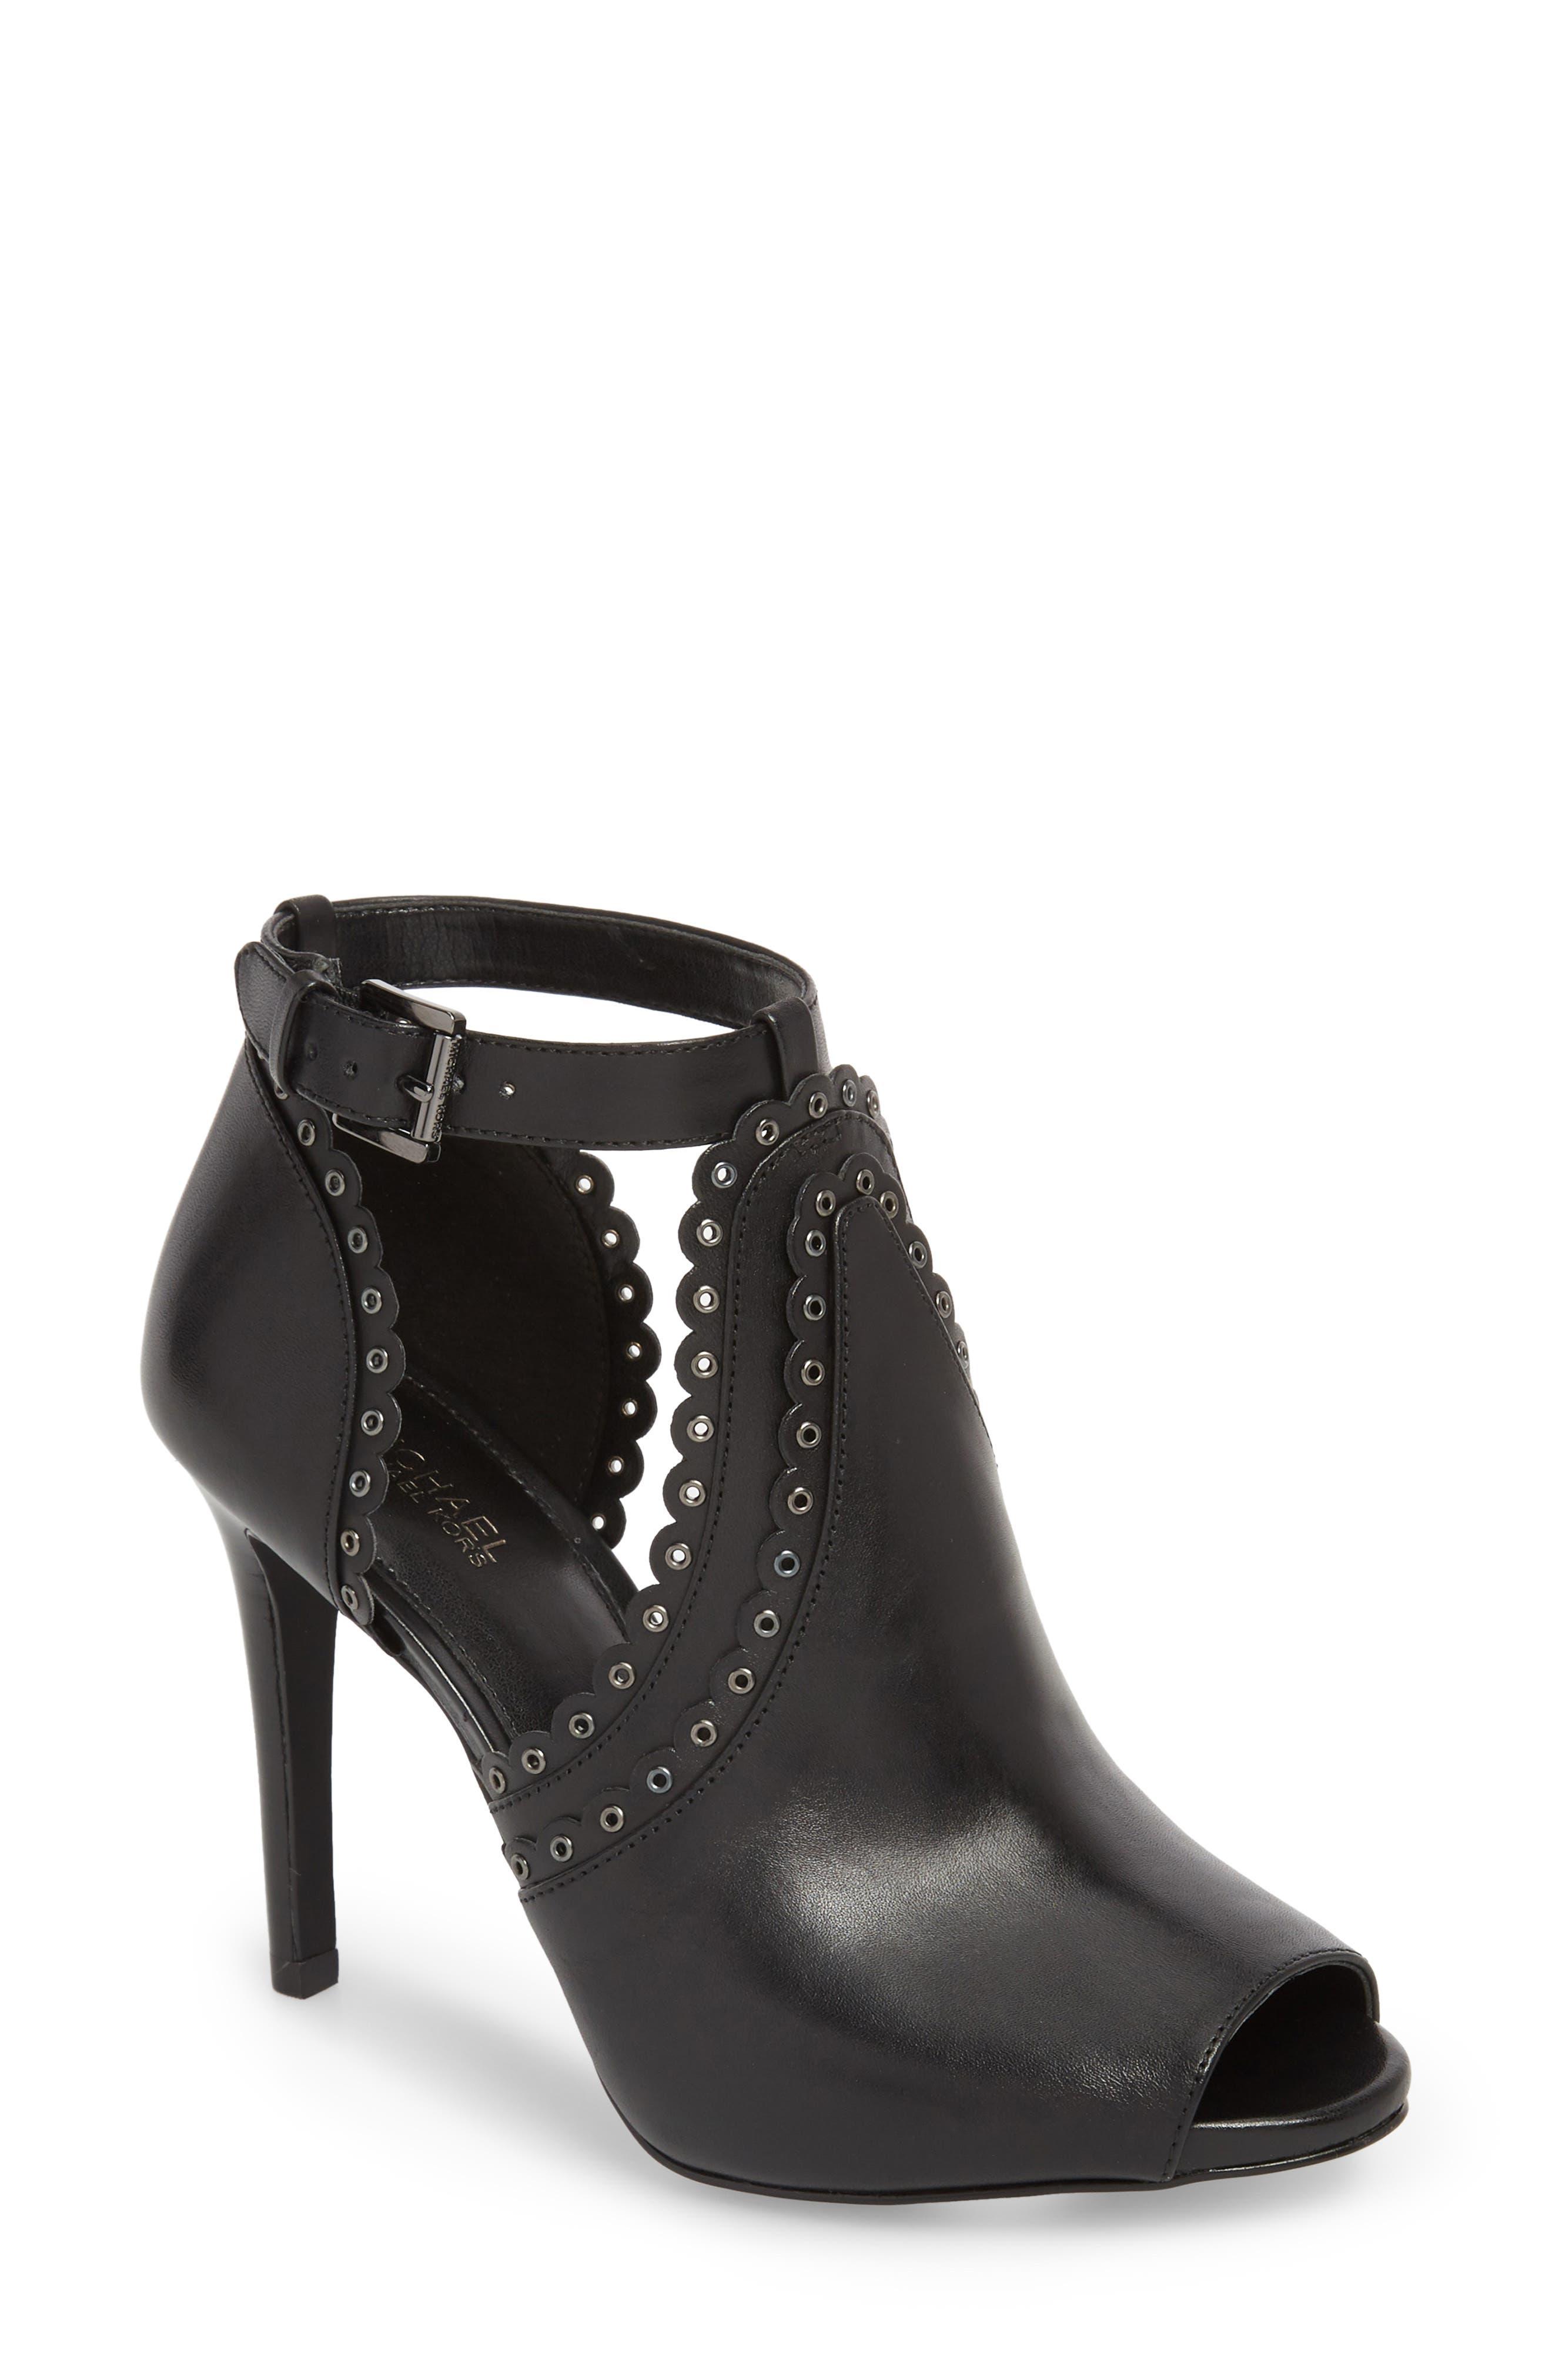 Jessie Ankle Strap Sandal by Michael Michael Kors